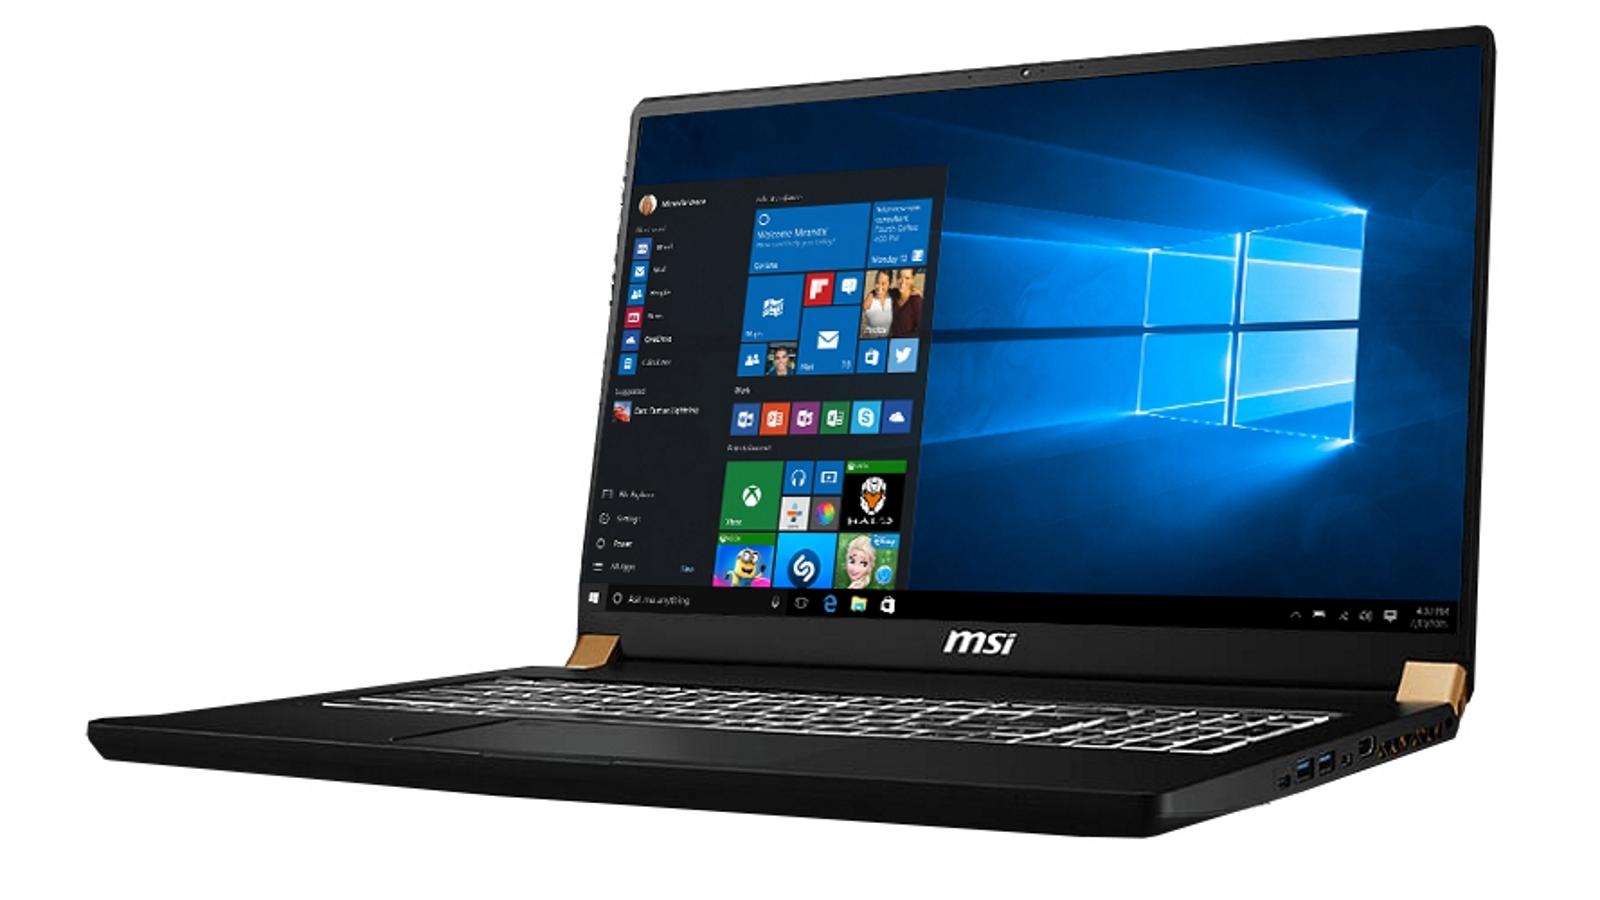 Buy Msi Workstation 17 3 Inch I7 32gb 1tb Ssd Laptop Black Harvey Norman Au